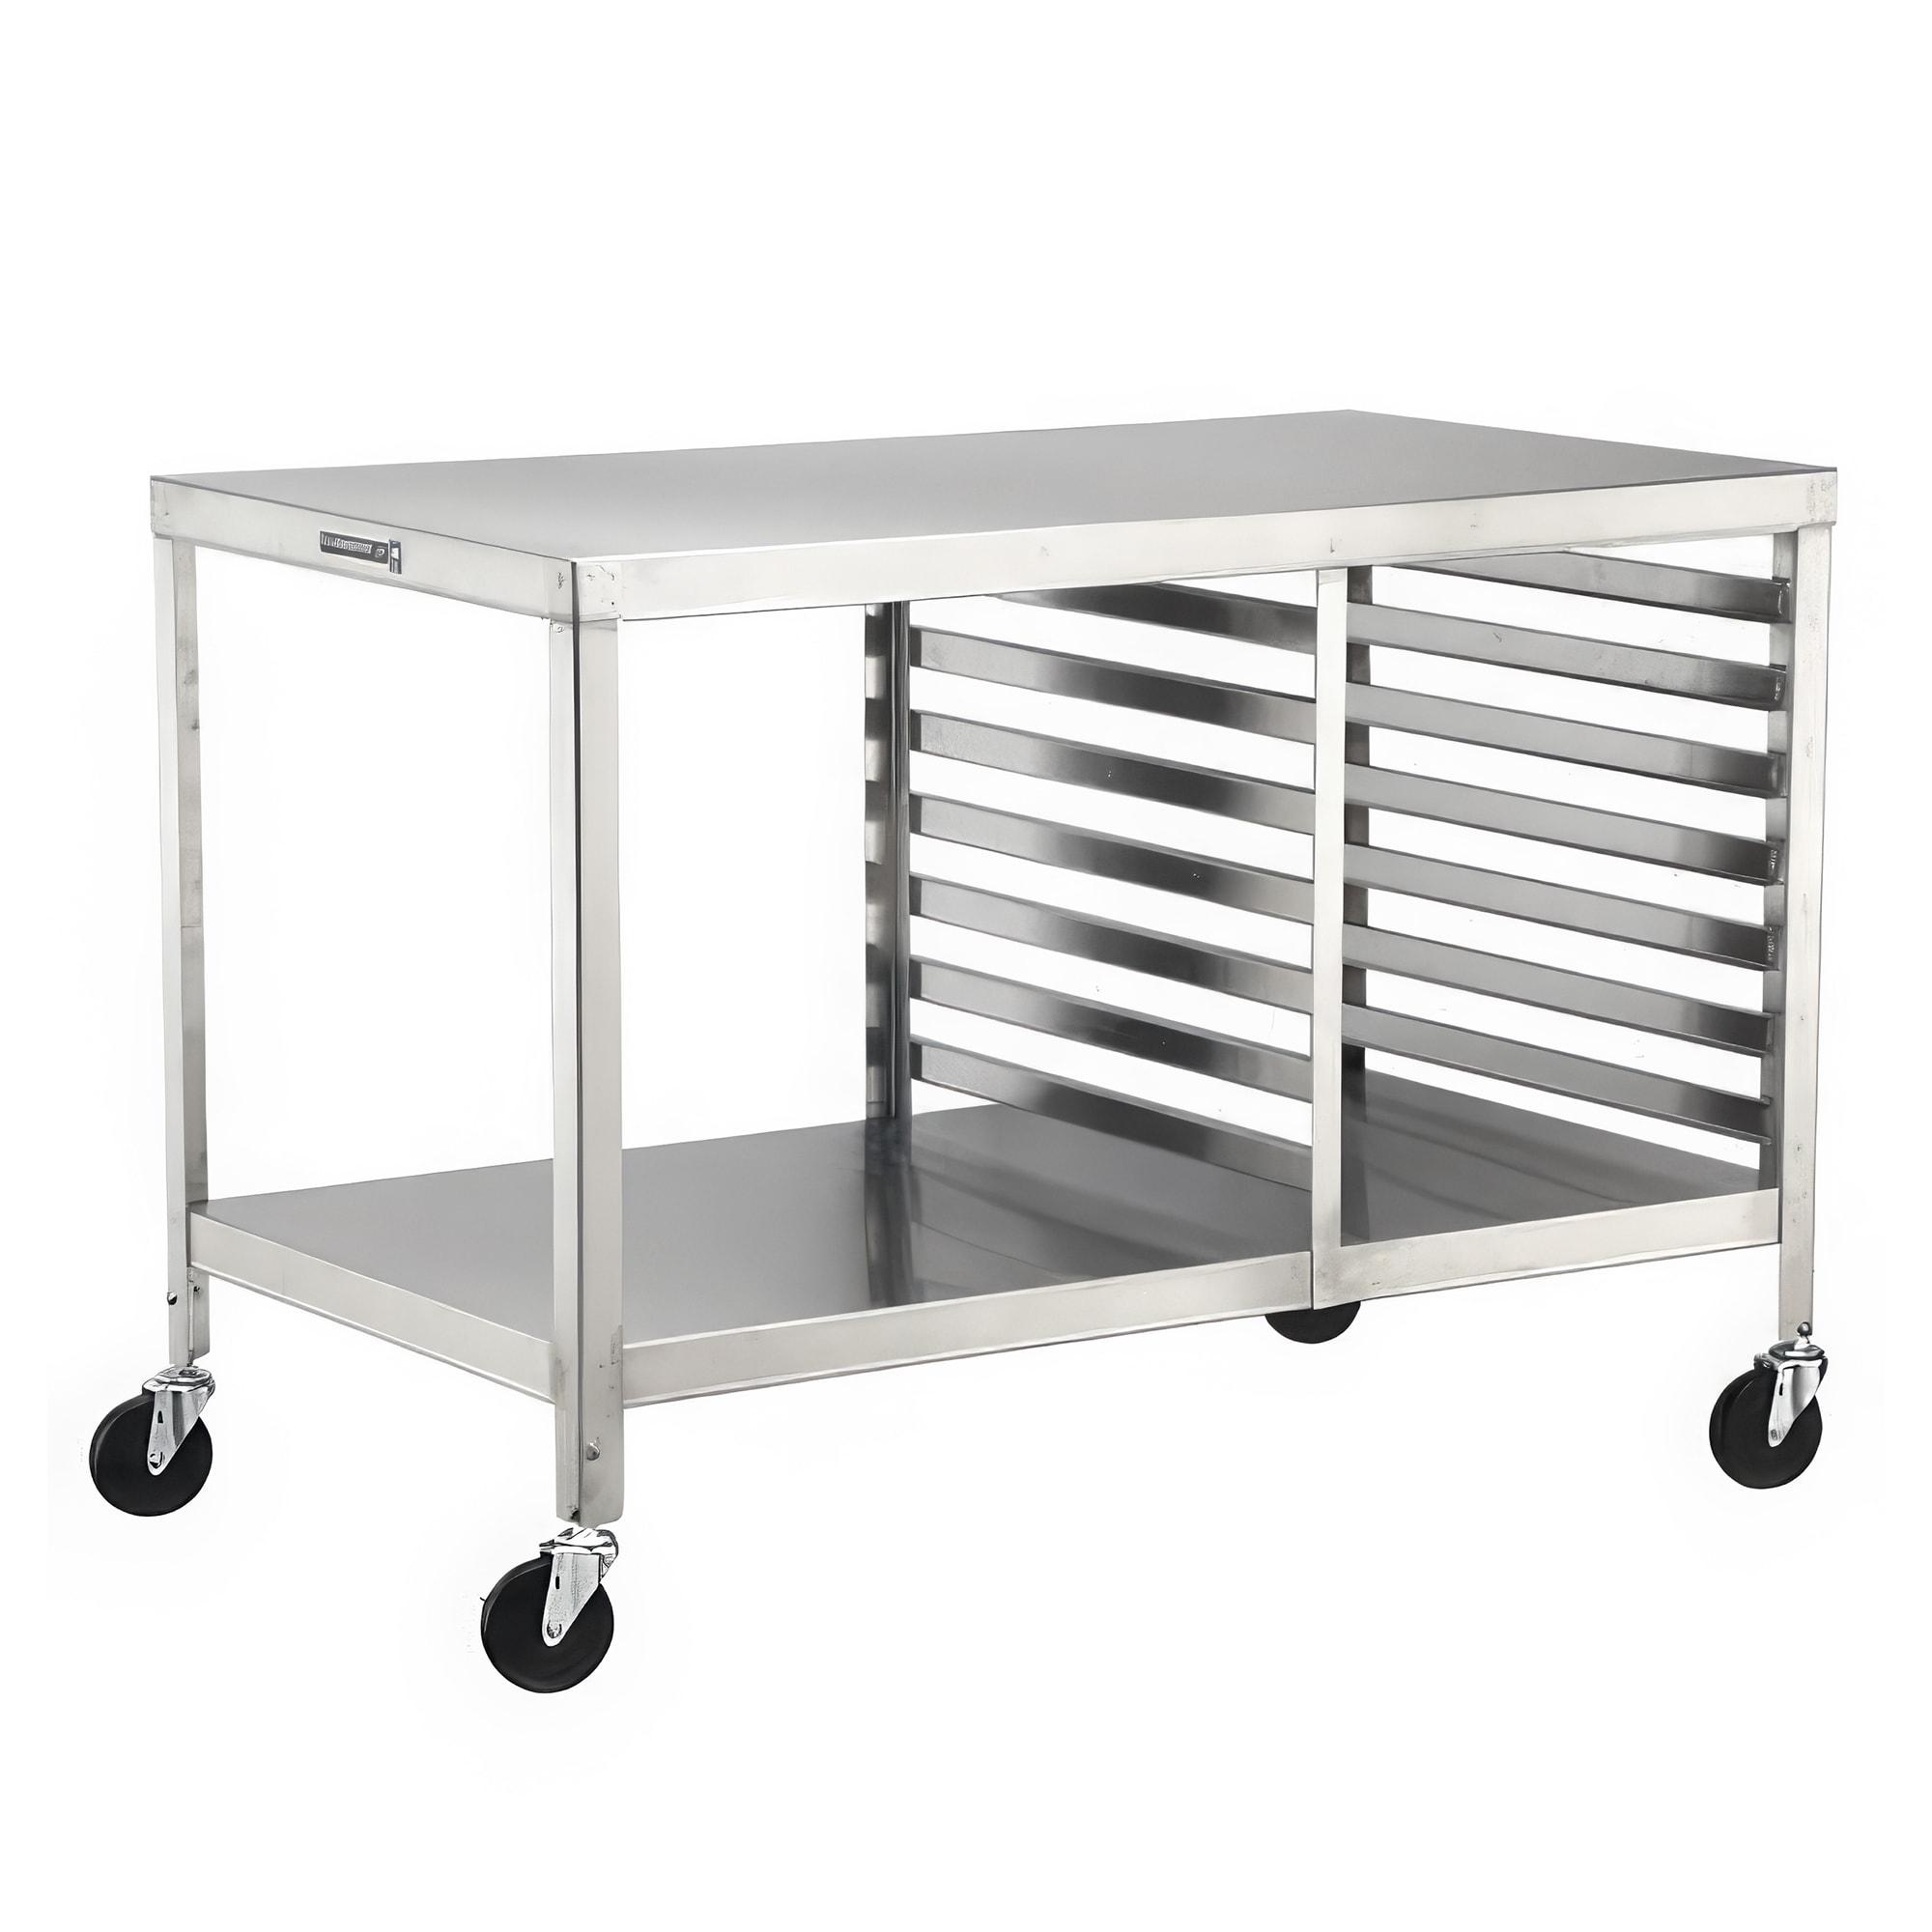 "Lakeside 130 Portable Work Table w/ Bottom Shelf, (15) 18 x 26"" Pan Capacity"